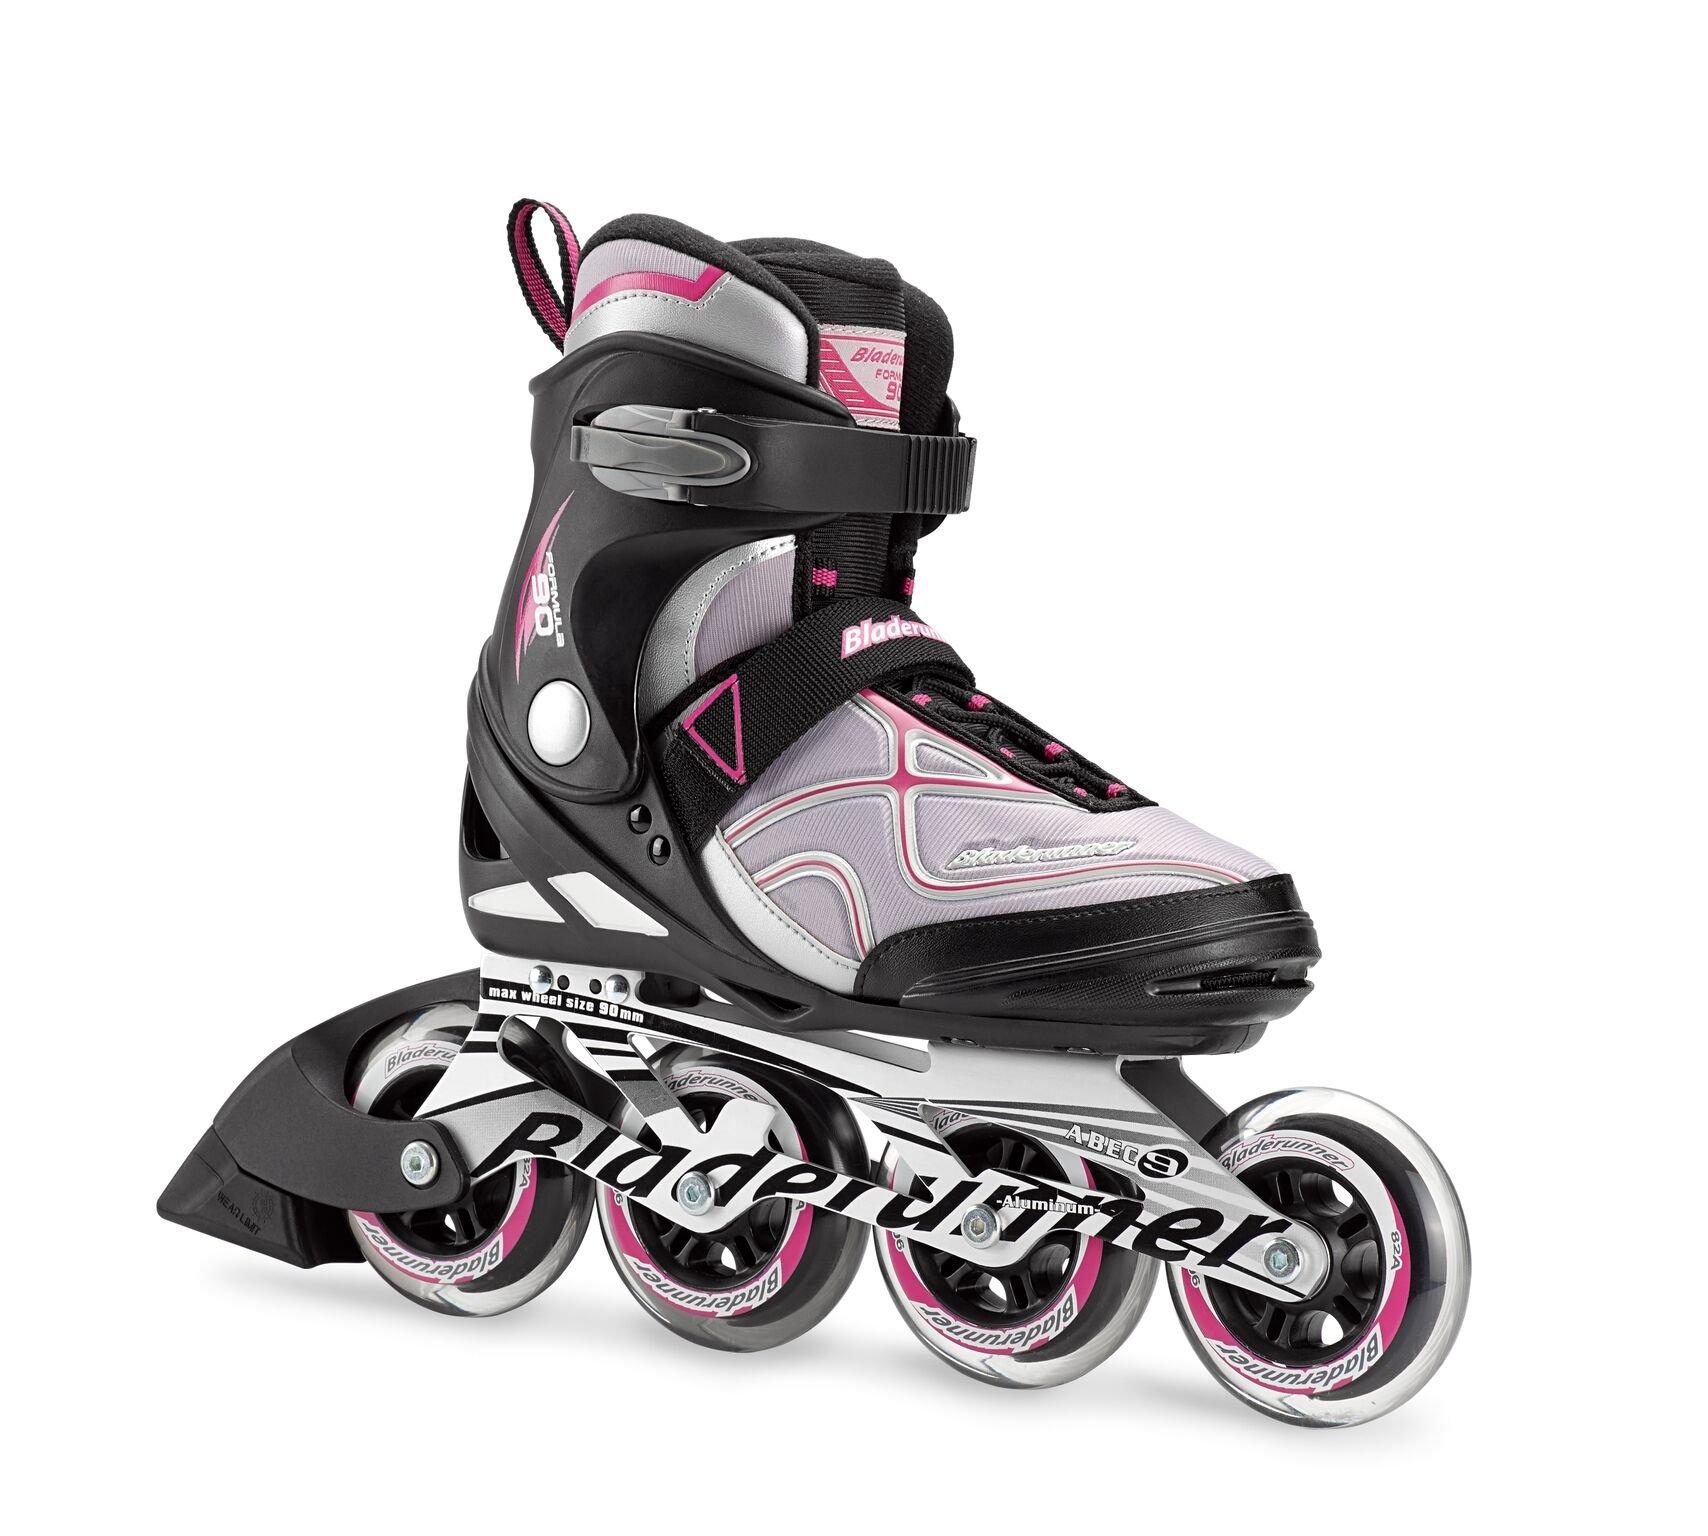 Bladerunner by Rollerblade Formula 90 Women's Adult Fitness Inline Skate, Black and Purple, Inline Skates by Bladerunner